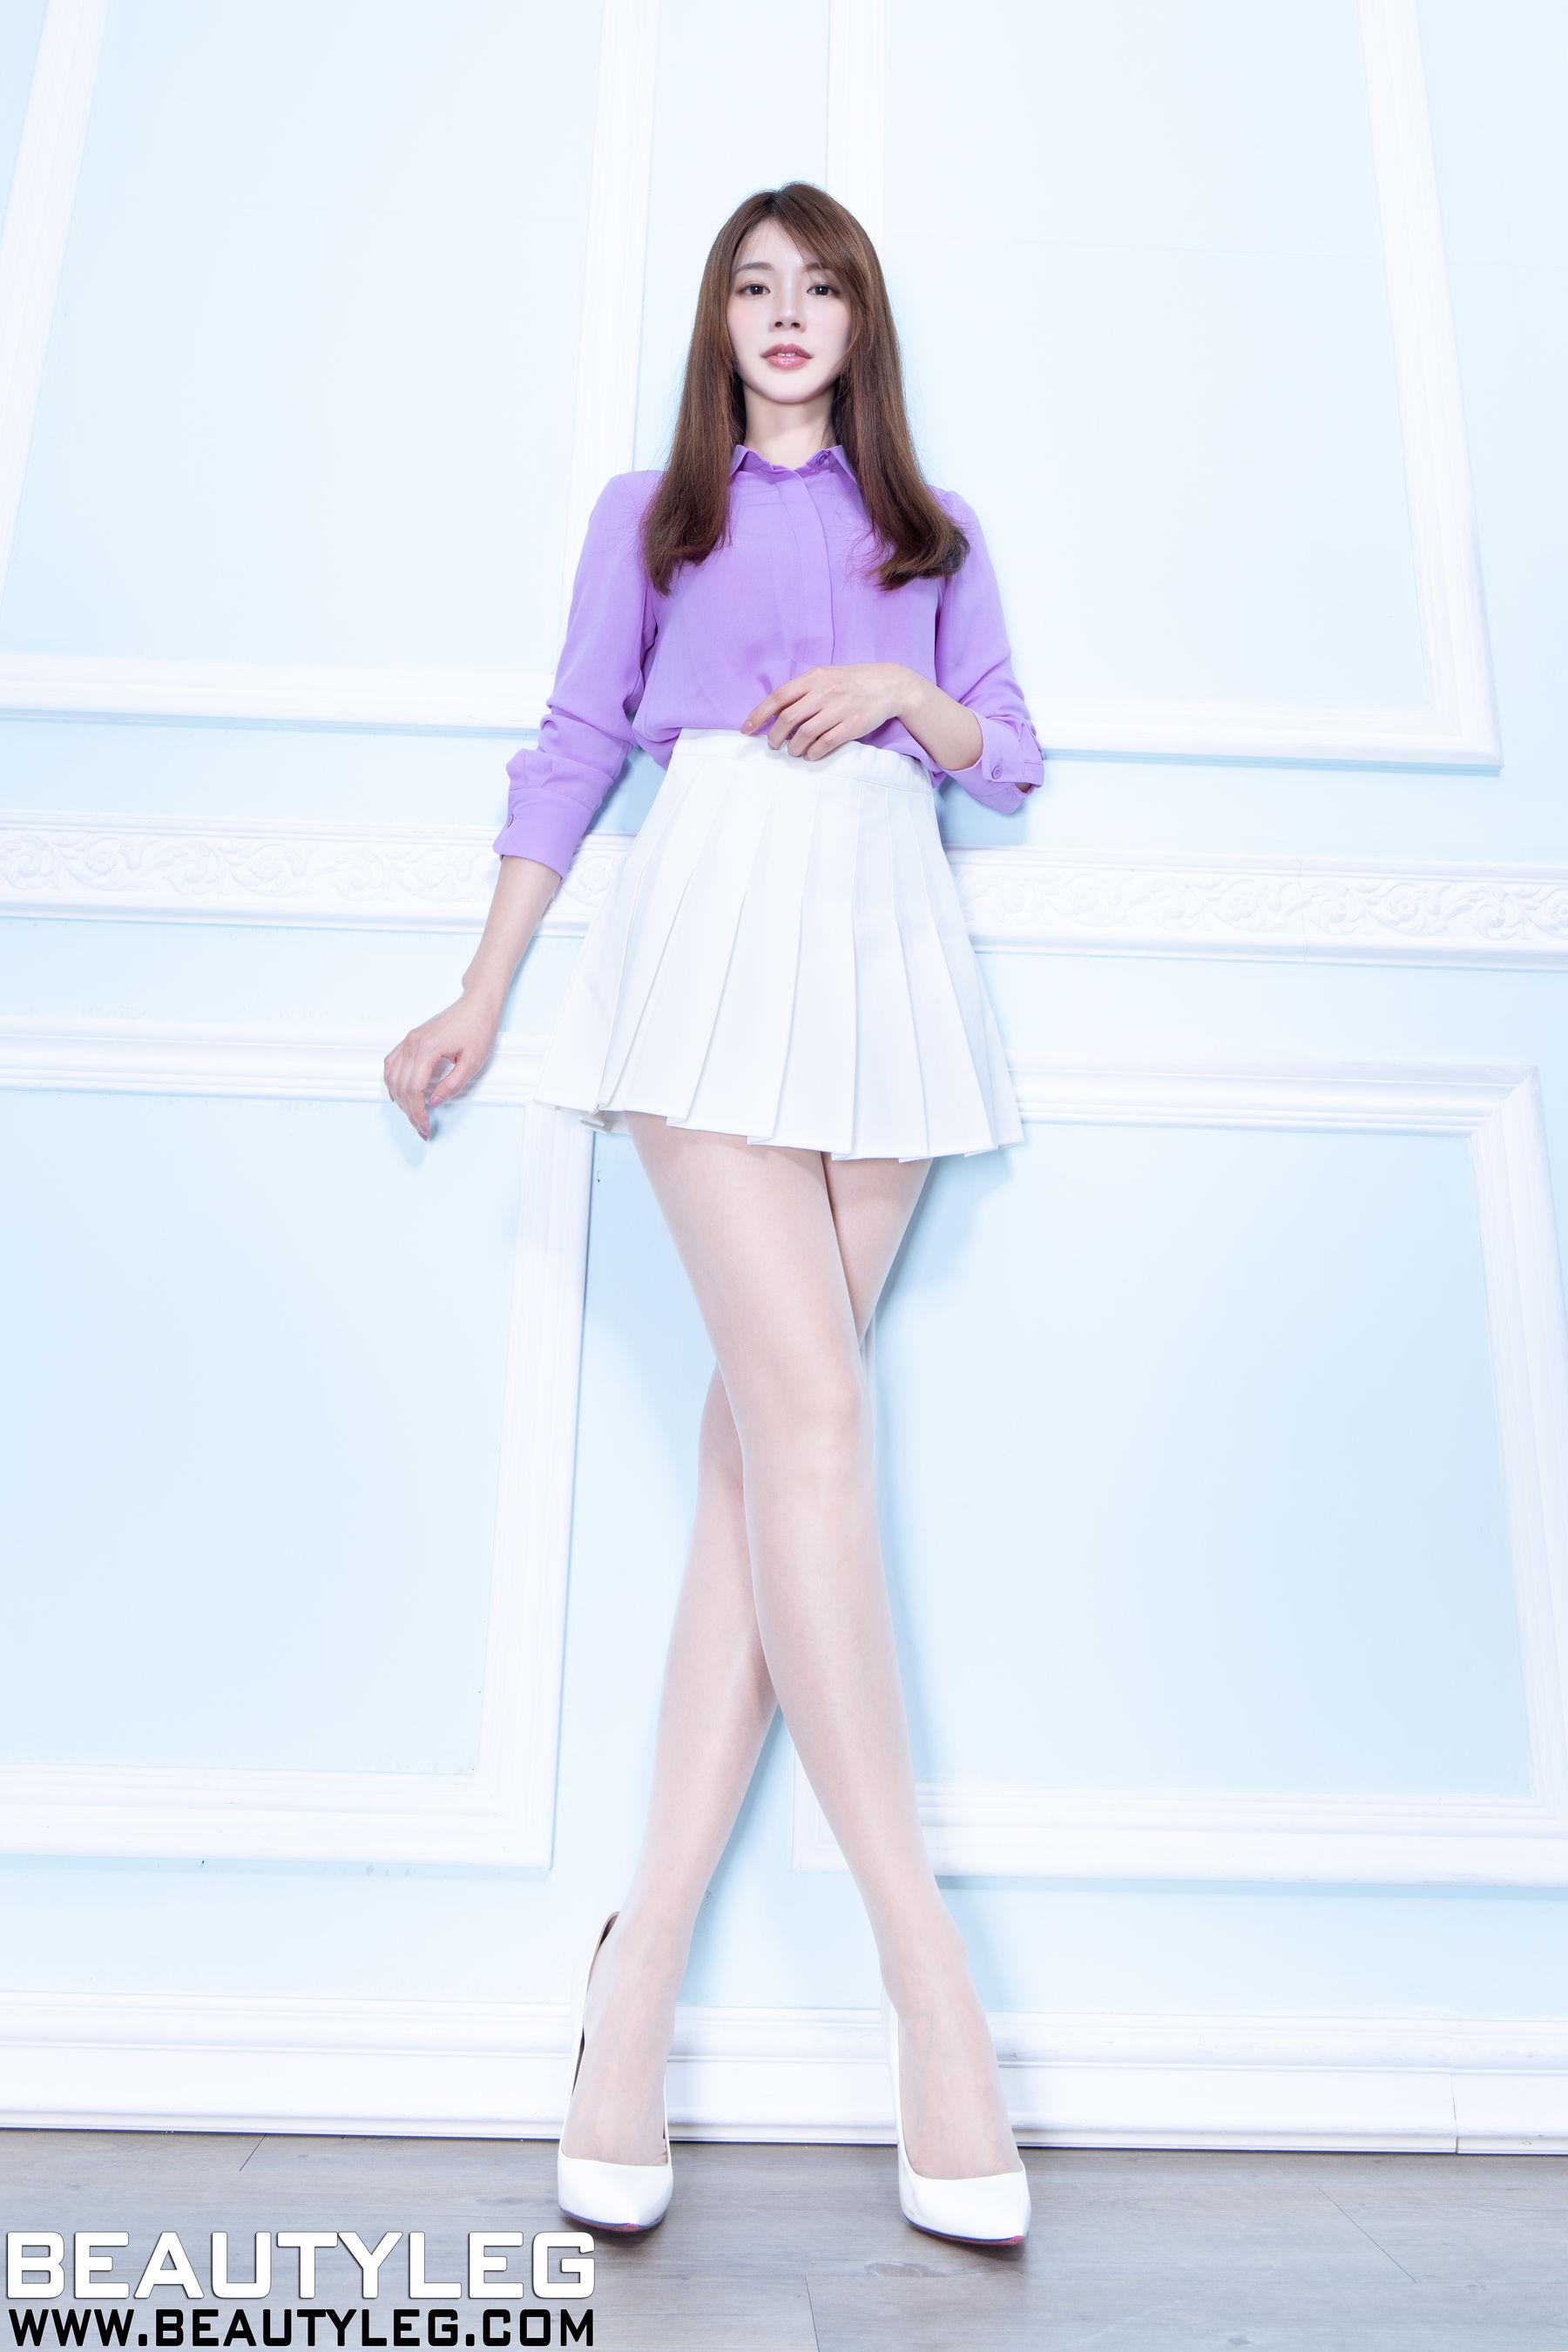 VOL.1719 [Beautyleg]肉丝美腿:腿模Cathy超高清个人性感漂亮大图(50P)